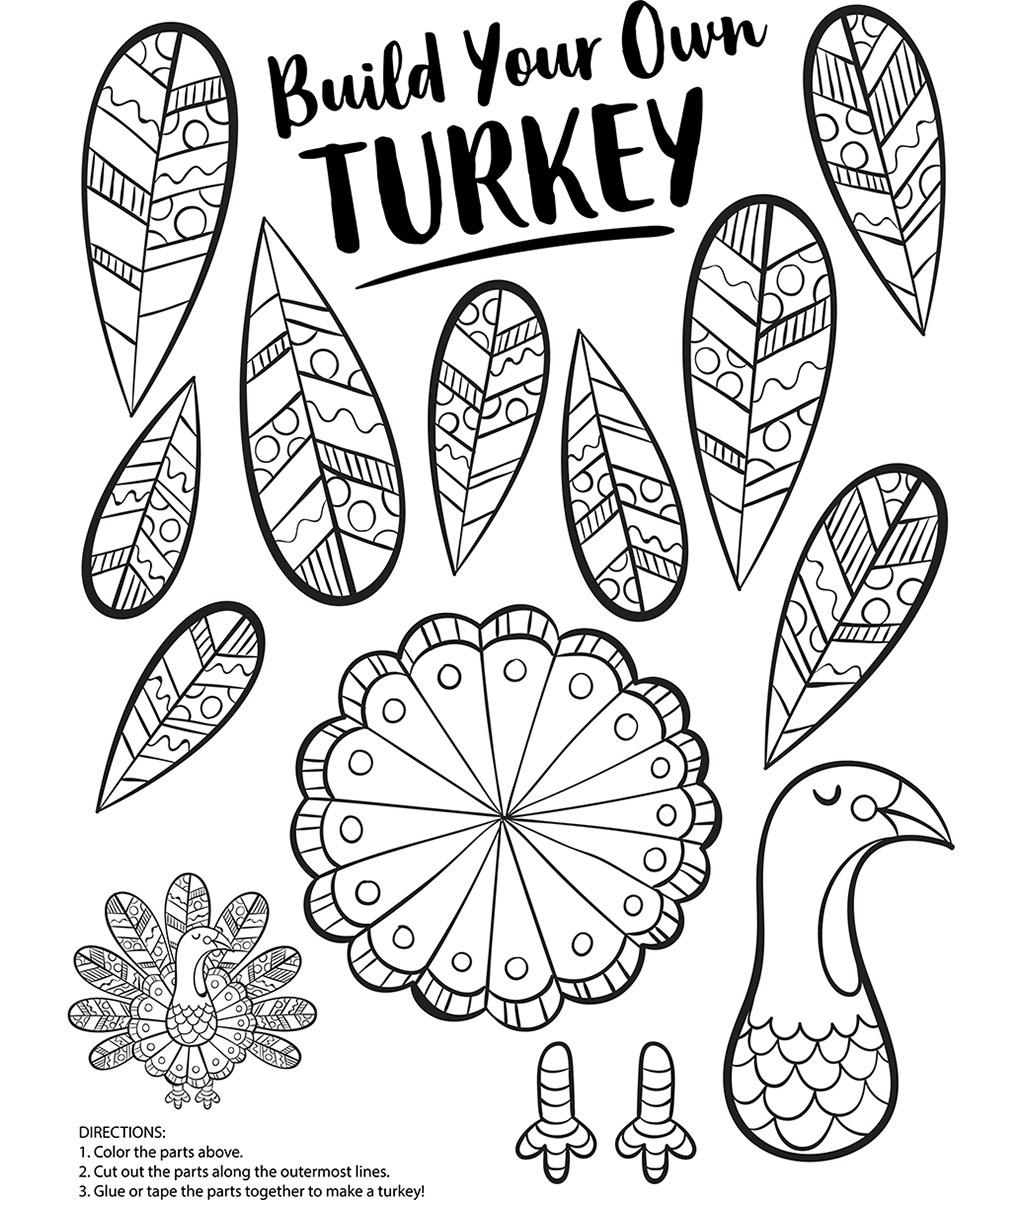 Build Your Own Turkey Coloring Page Crayola Com